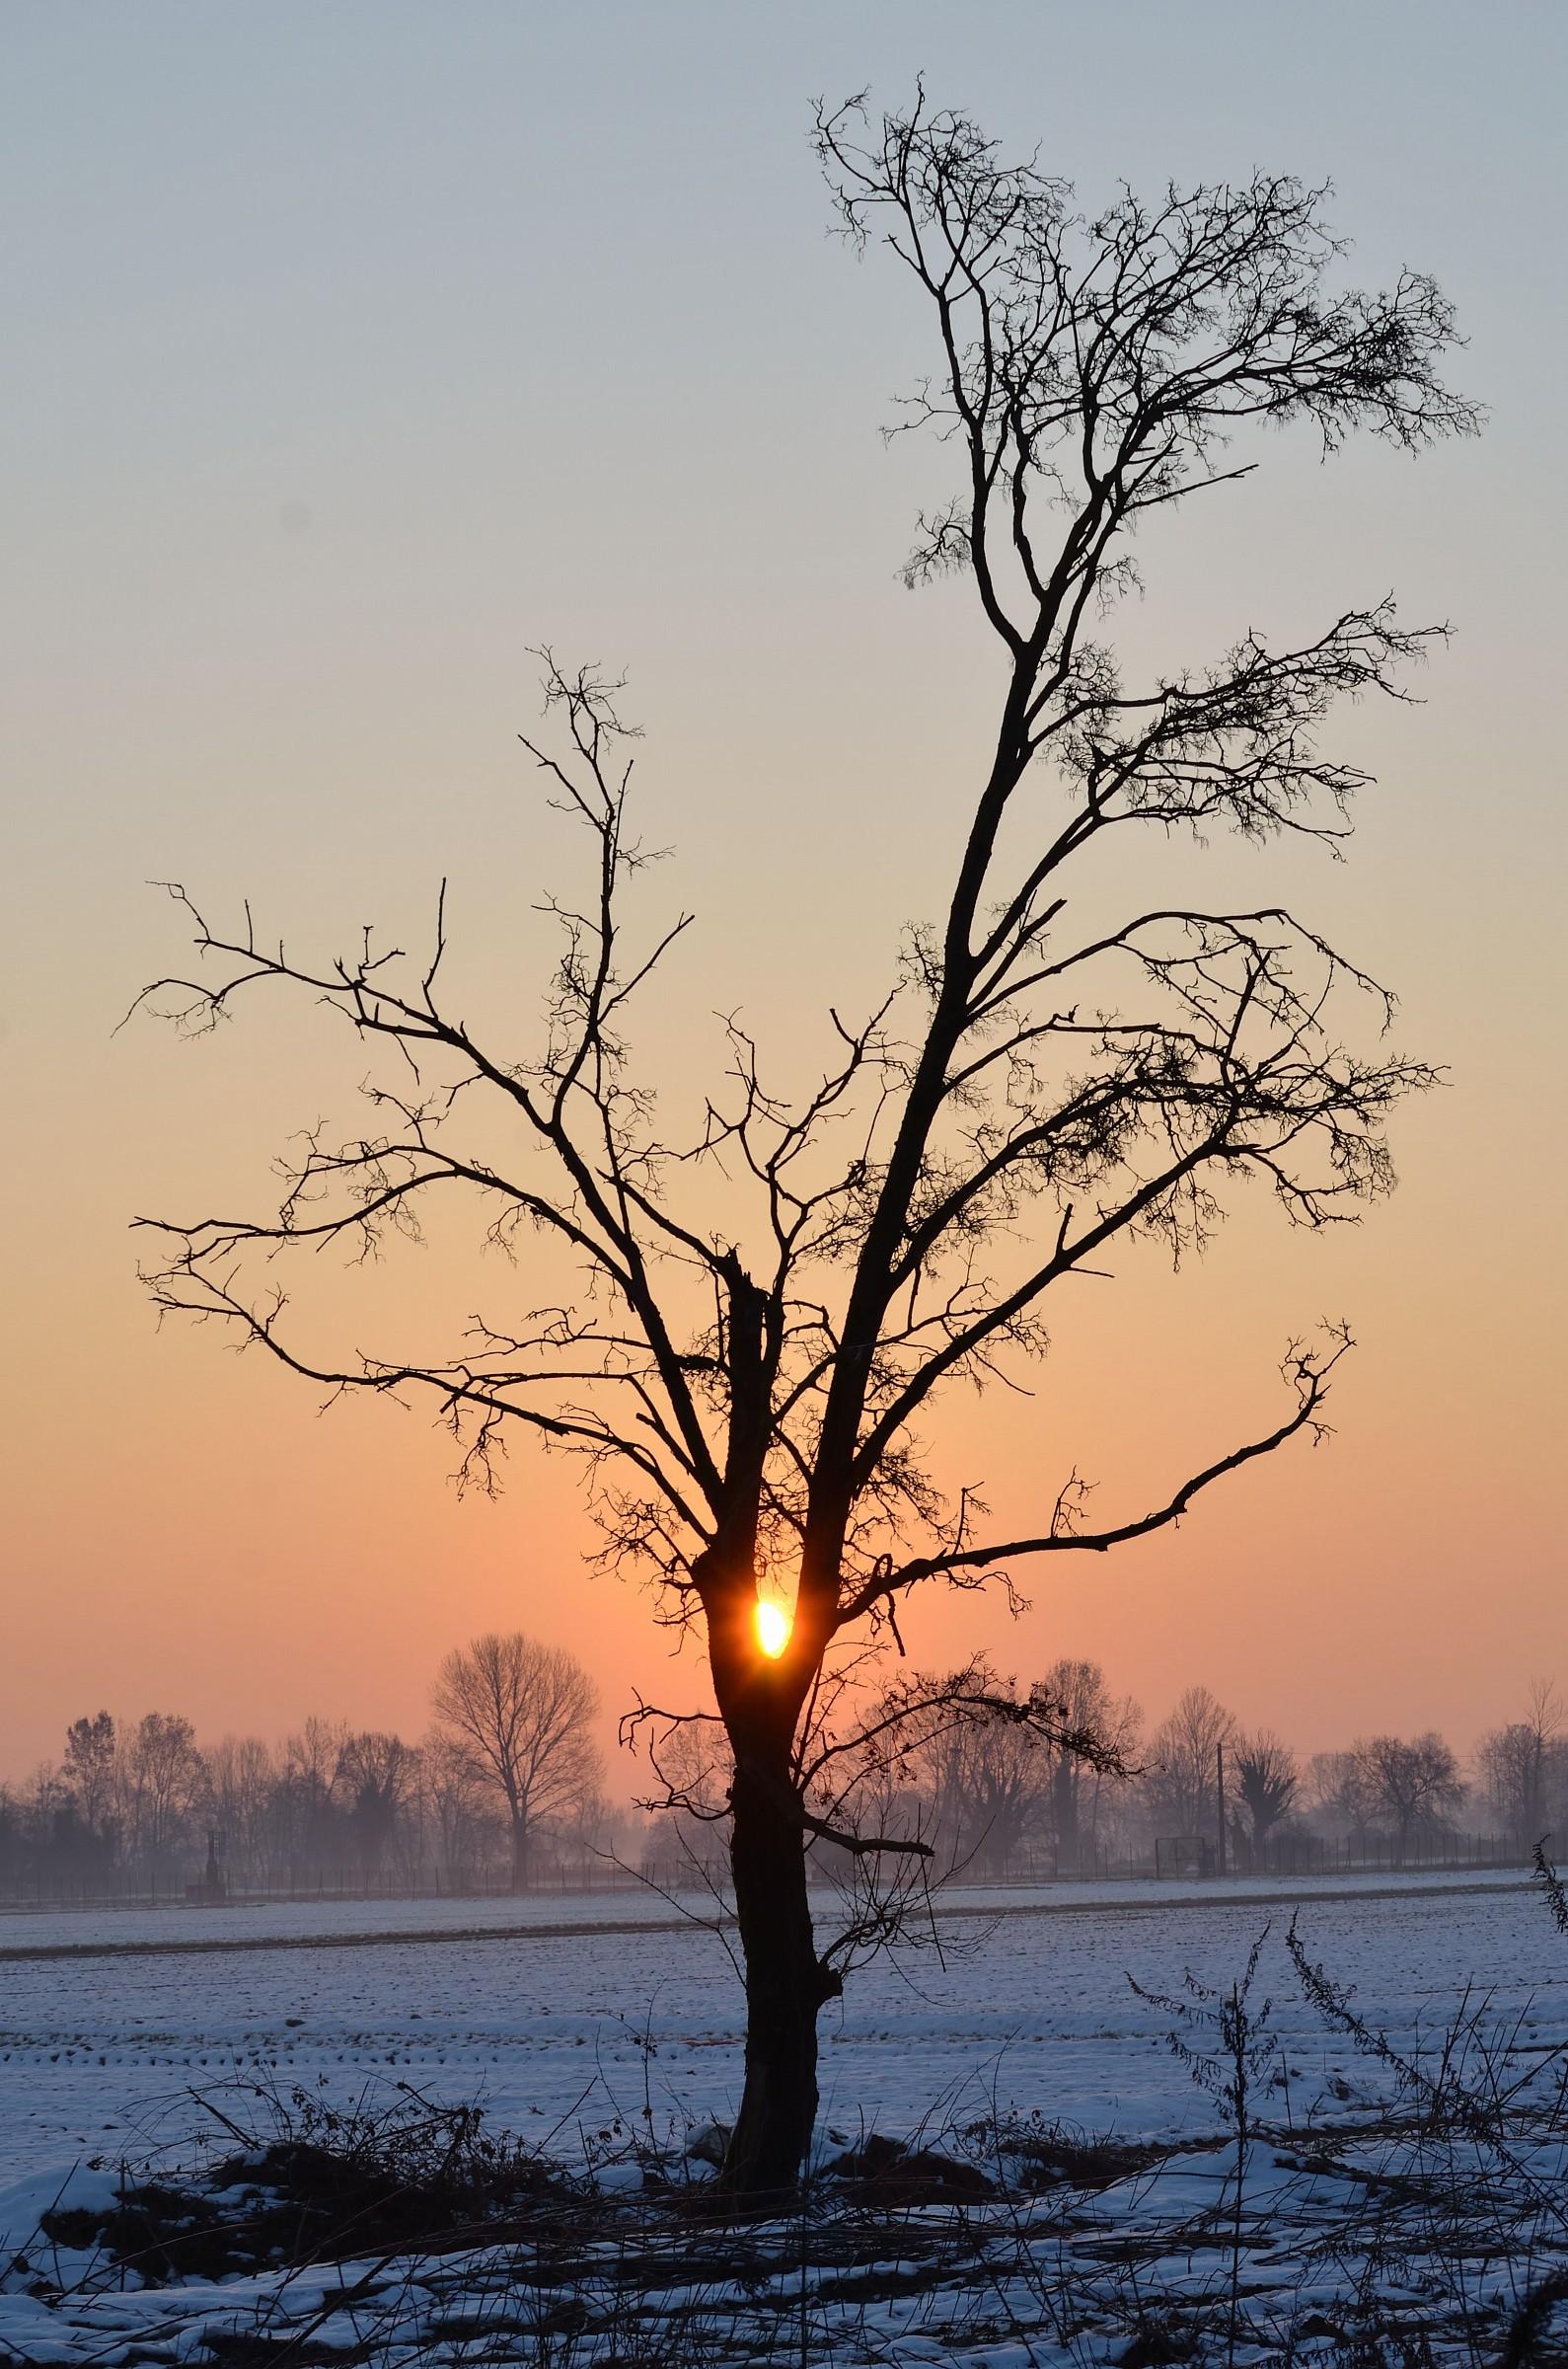 January 1, 2015 the dawn auguroni €€€ €€€...